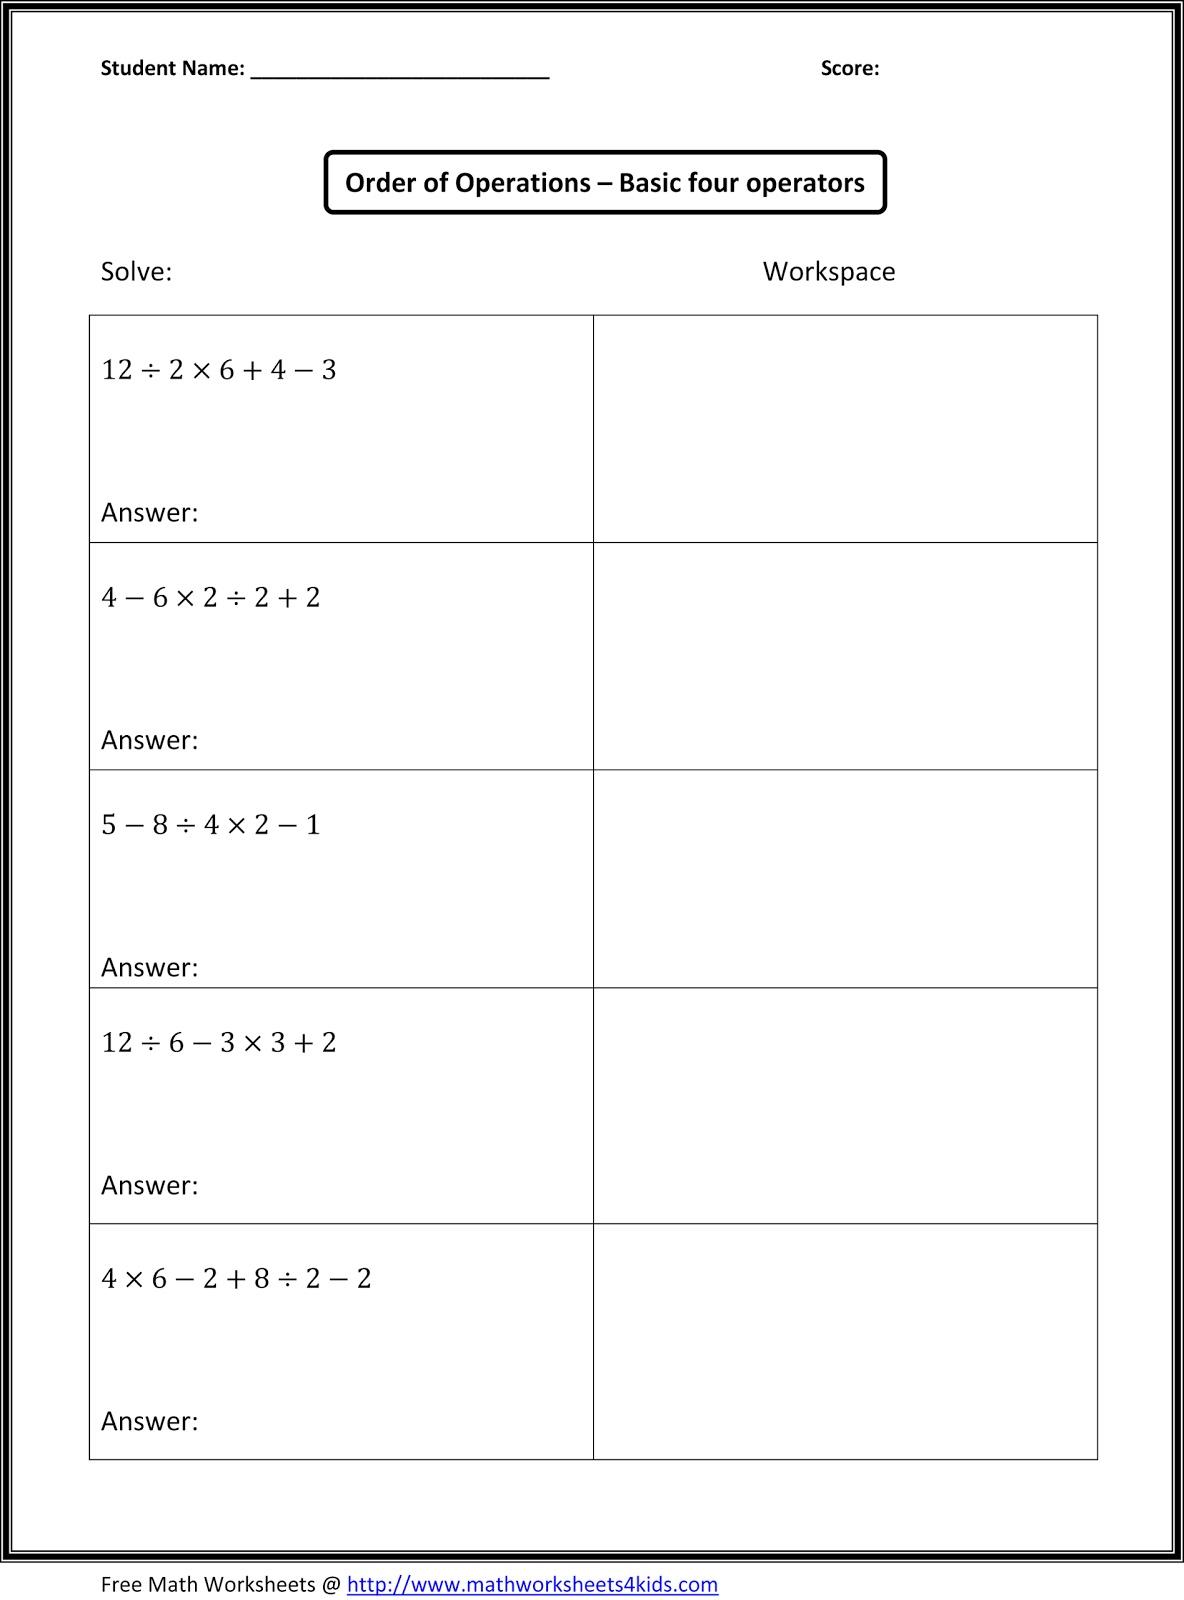 worksheet Math Worksheets Grade 6 Algebra algebra worksheets grade 7 free library download and m th lgebr w ksheets gr de topics college ess ys